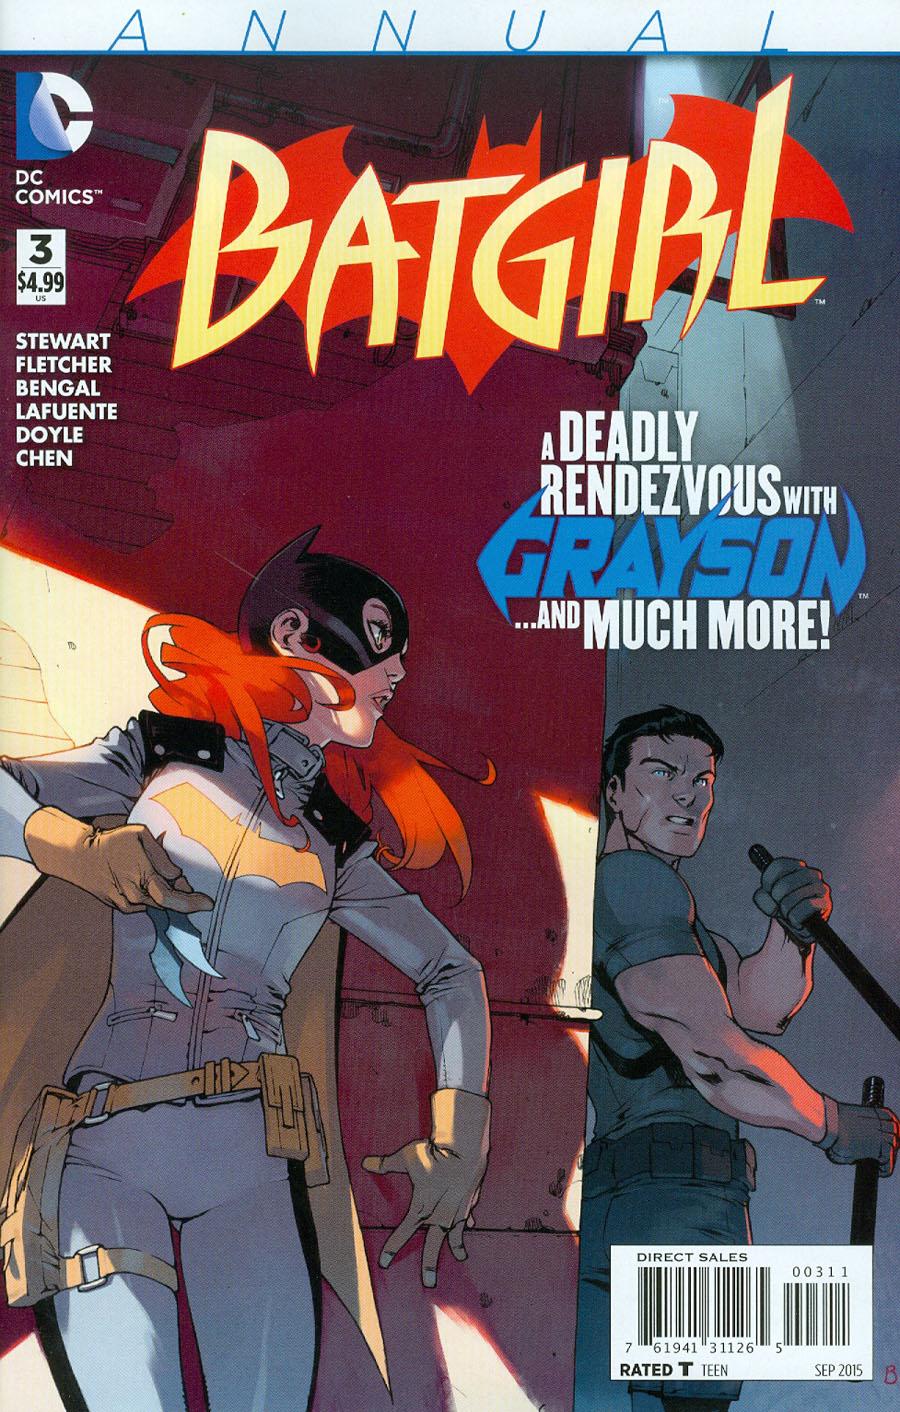 Batgirl Vol 4 Annual #3